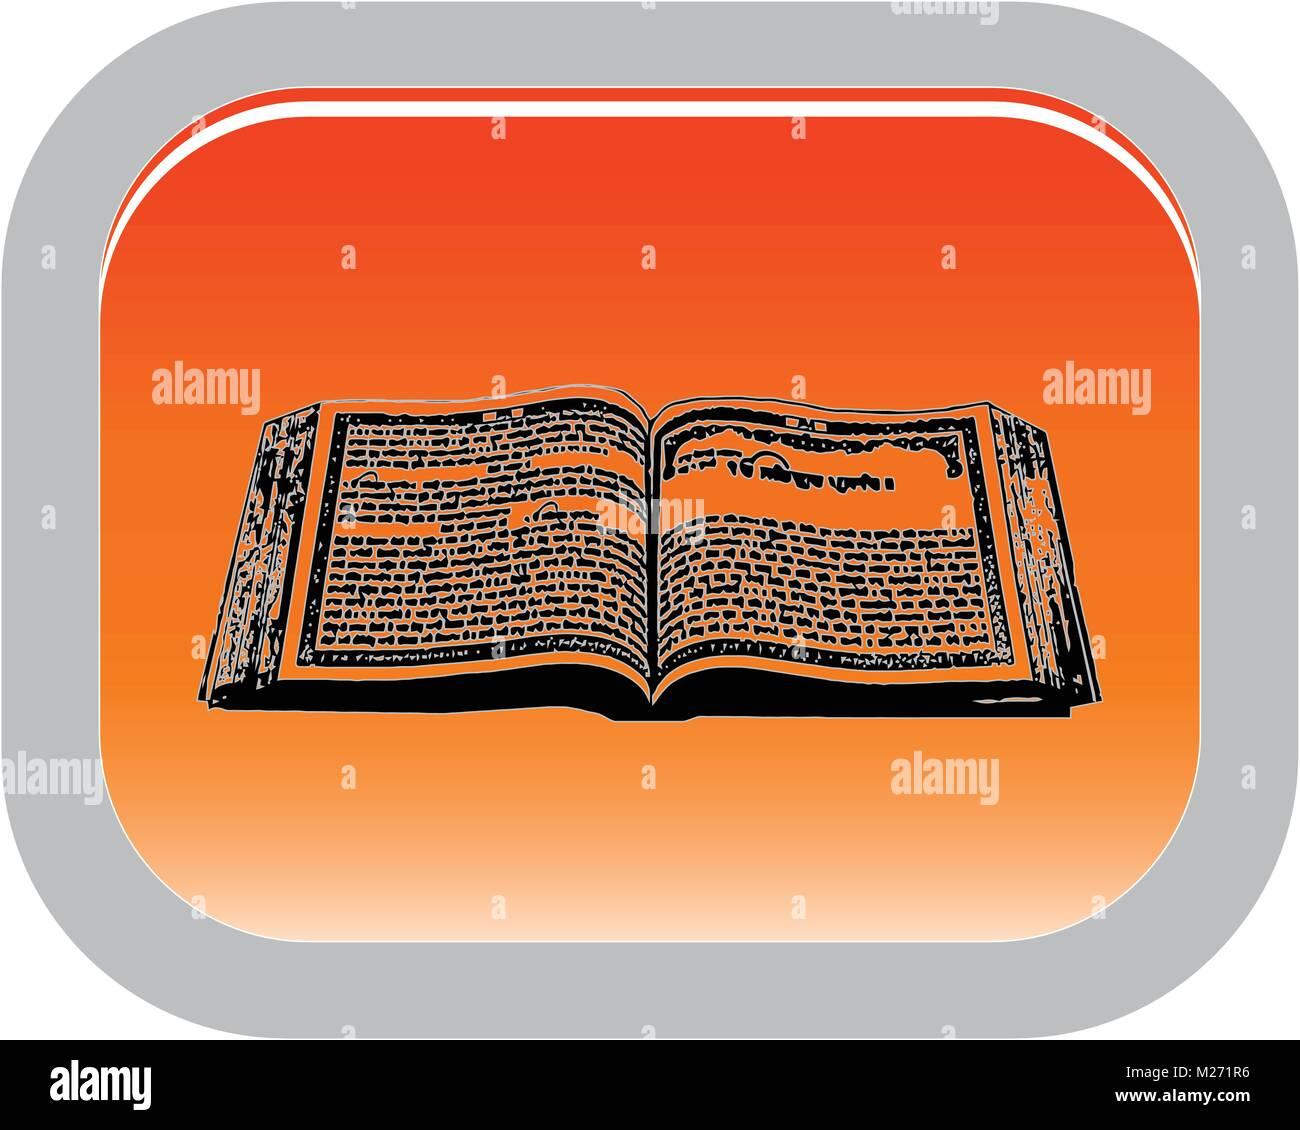 The Symbol Of The Sikhism Holy Book Guru Granth Sahib Button